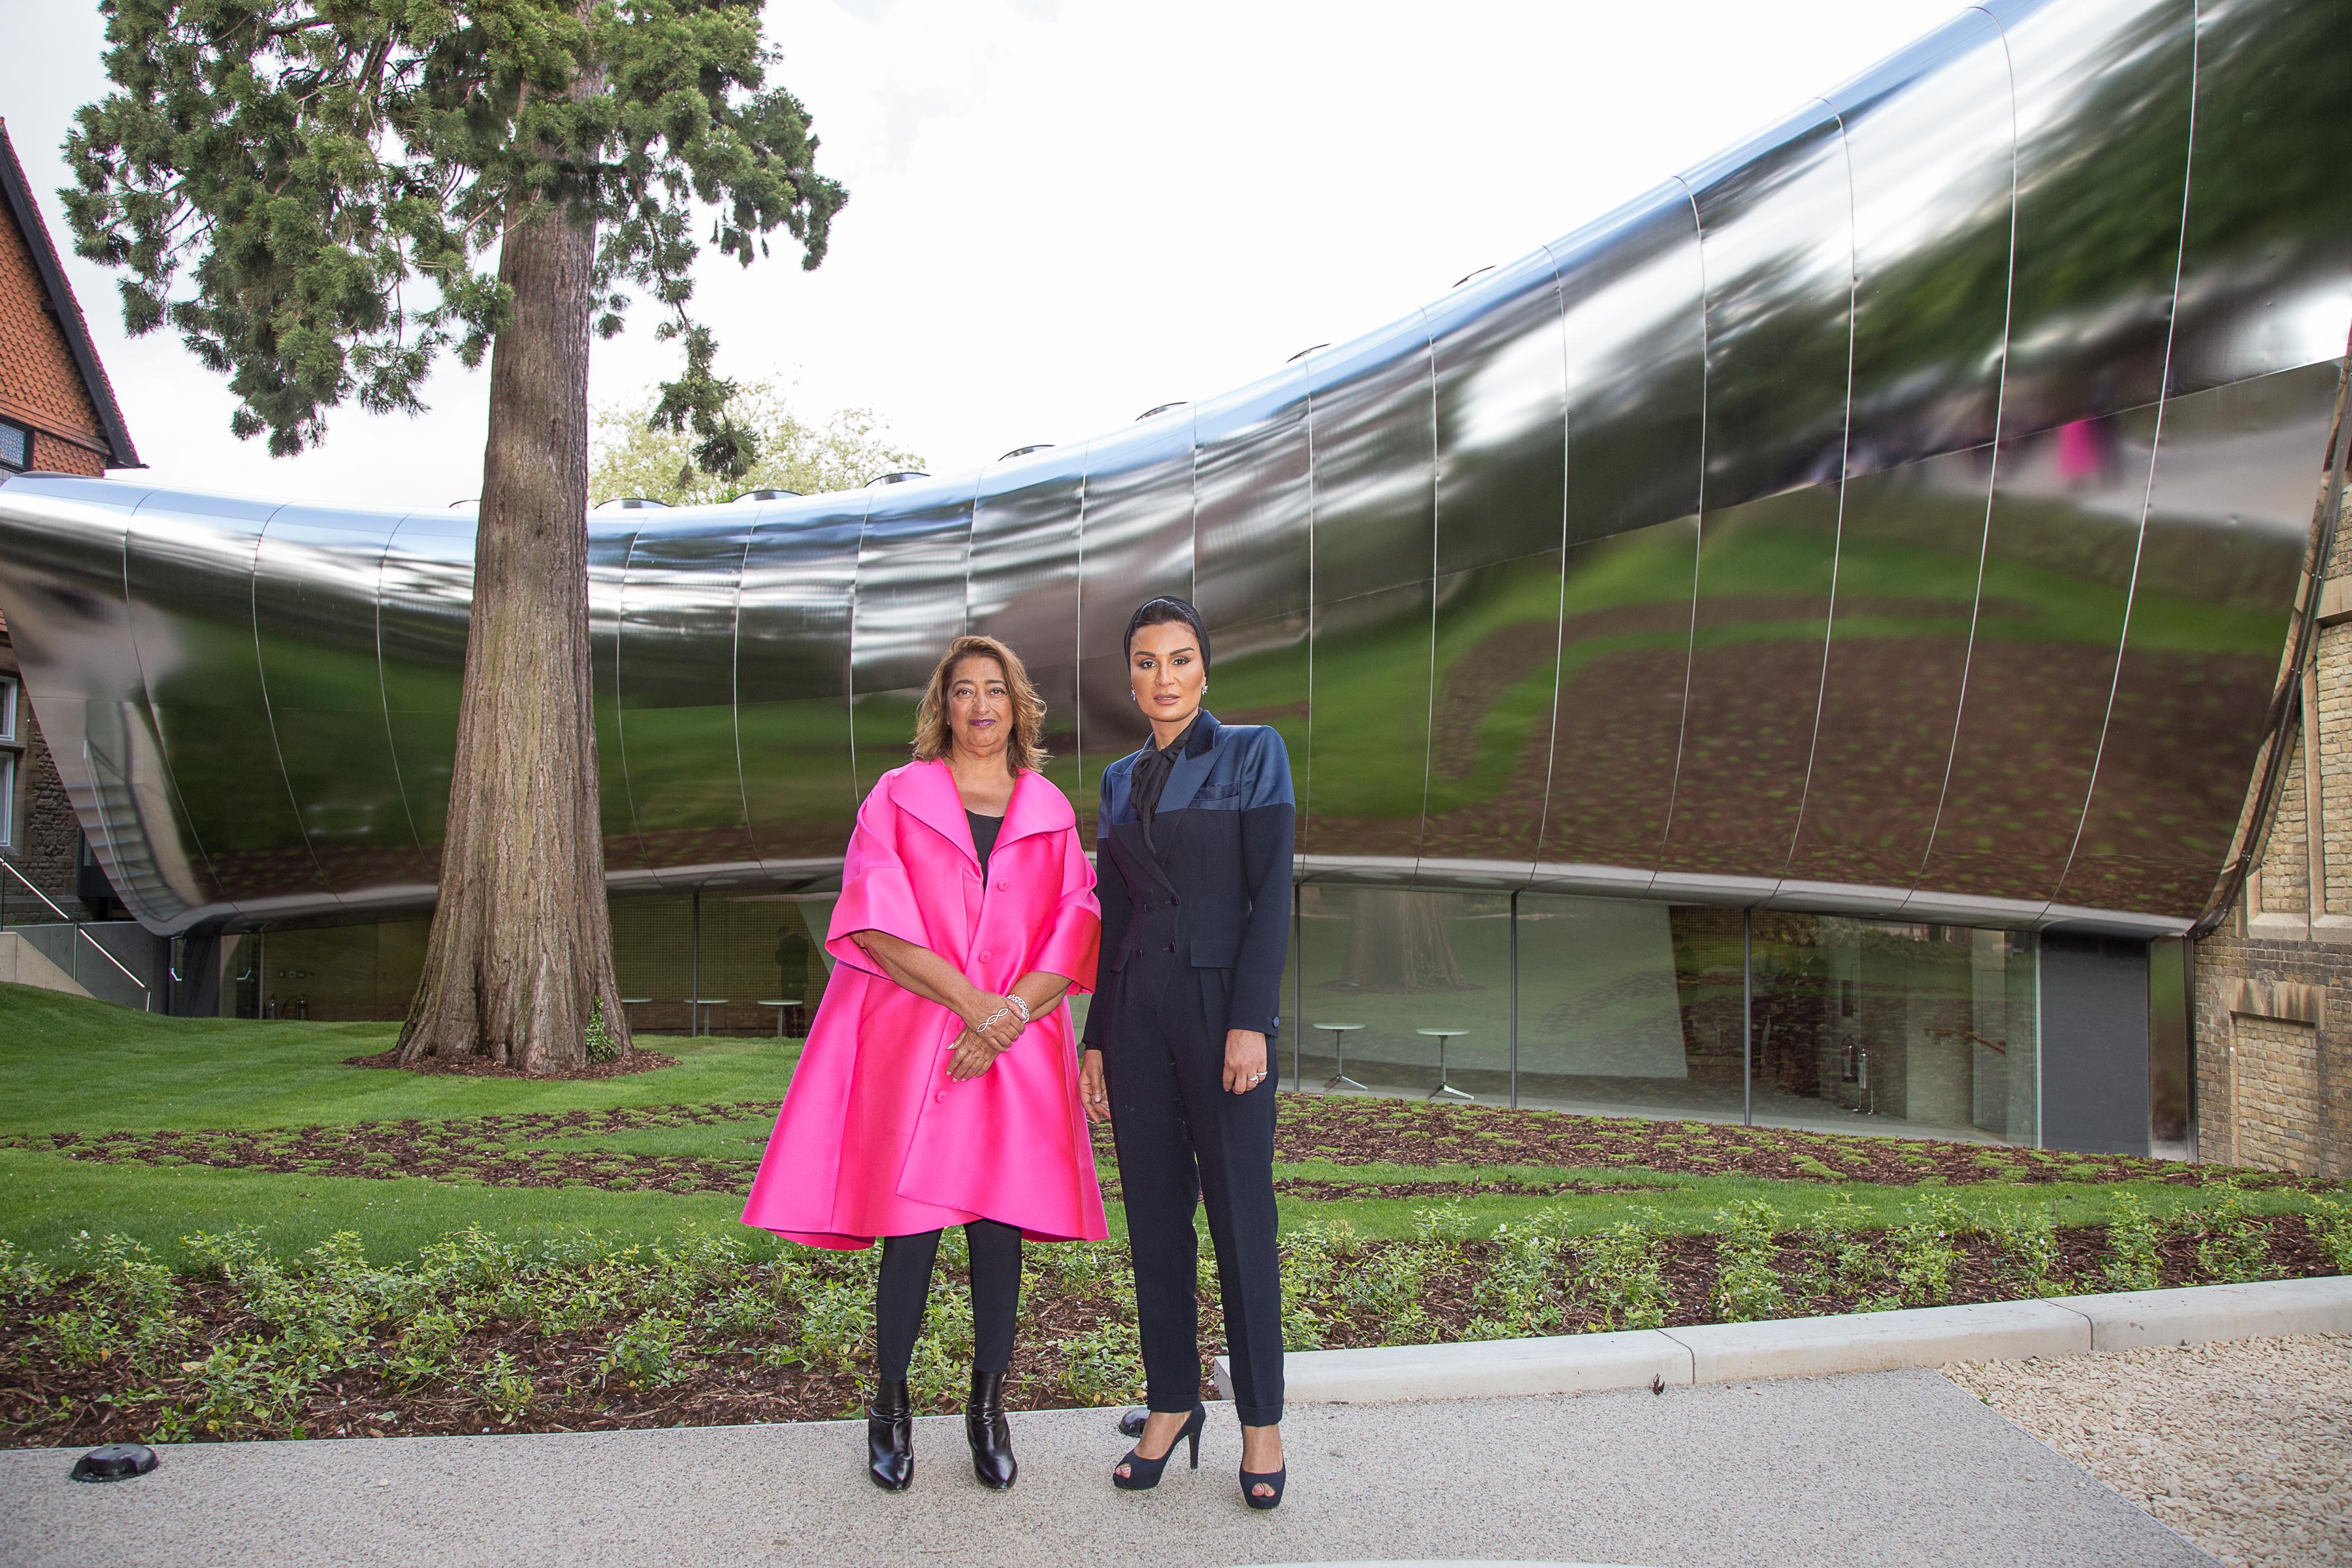 New building by Zaha Hadid unveiled at Middle East Centre ... on zaha hadid port house, old house, rem koolhaas house, zaha hadid california house, china house, zaha hadid opera house,